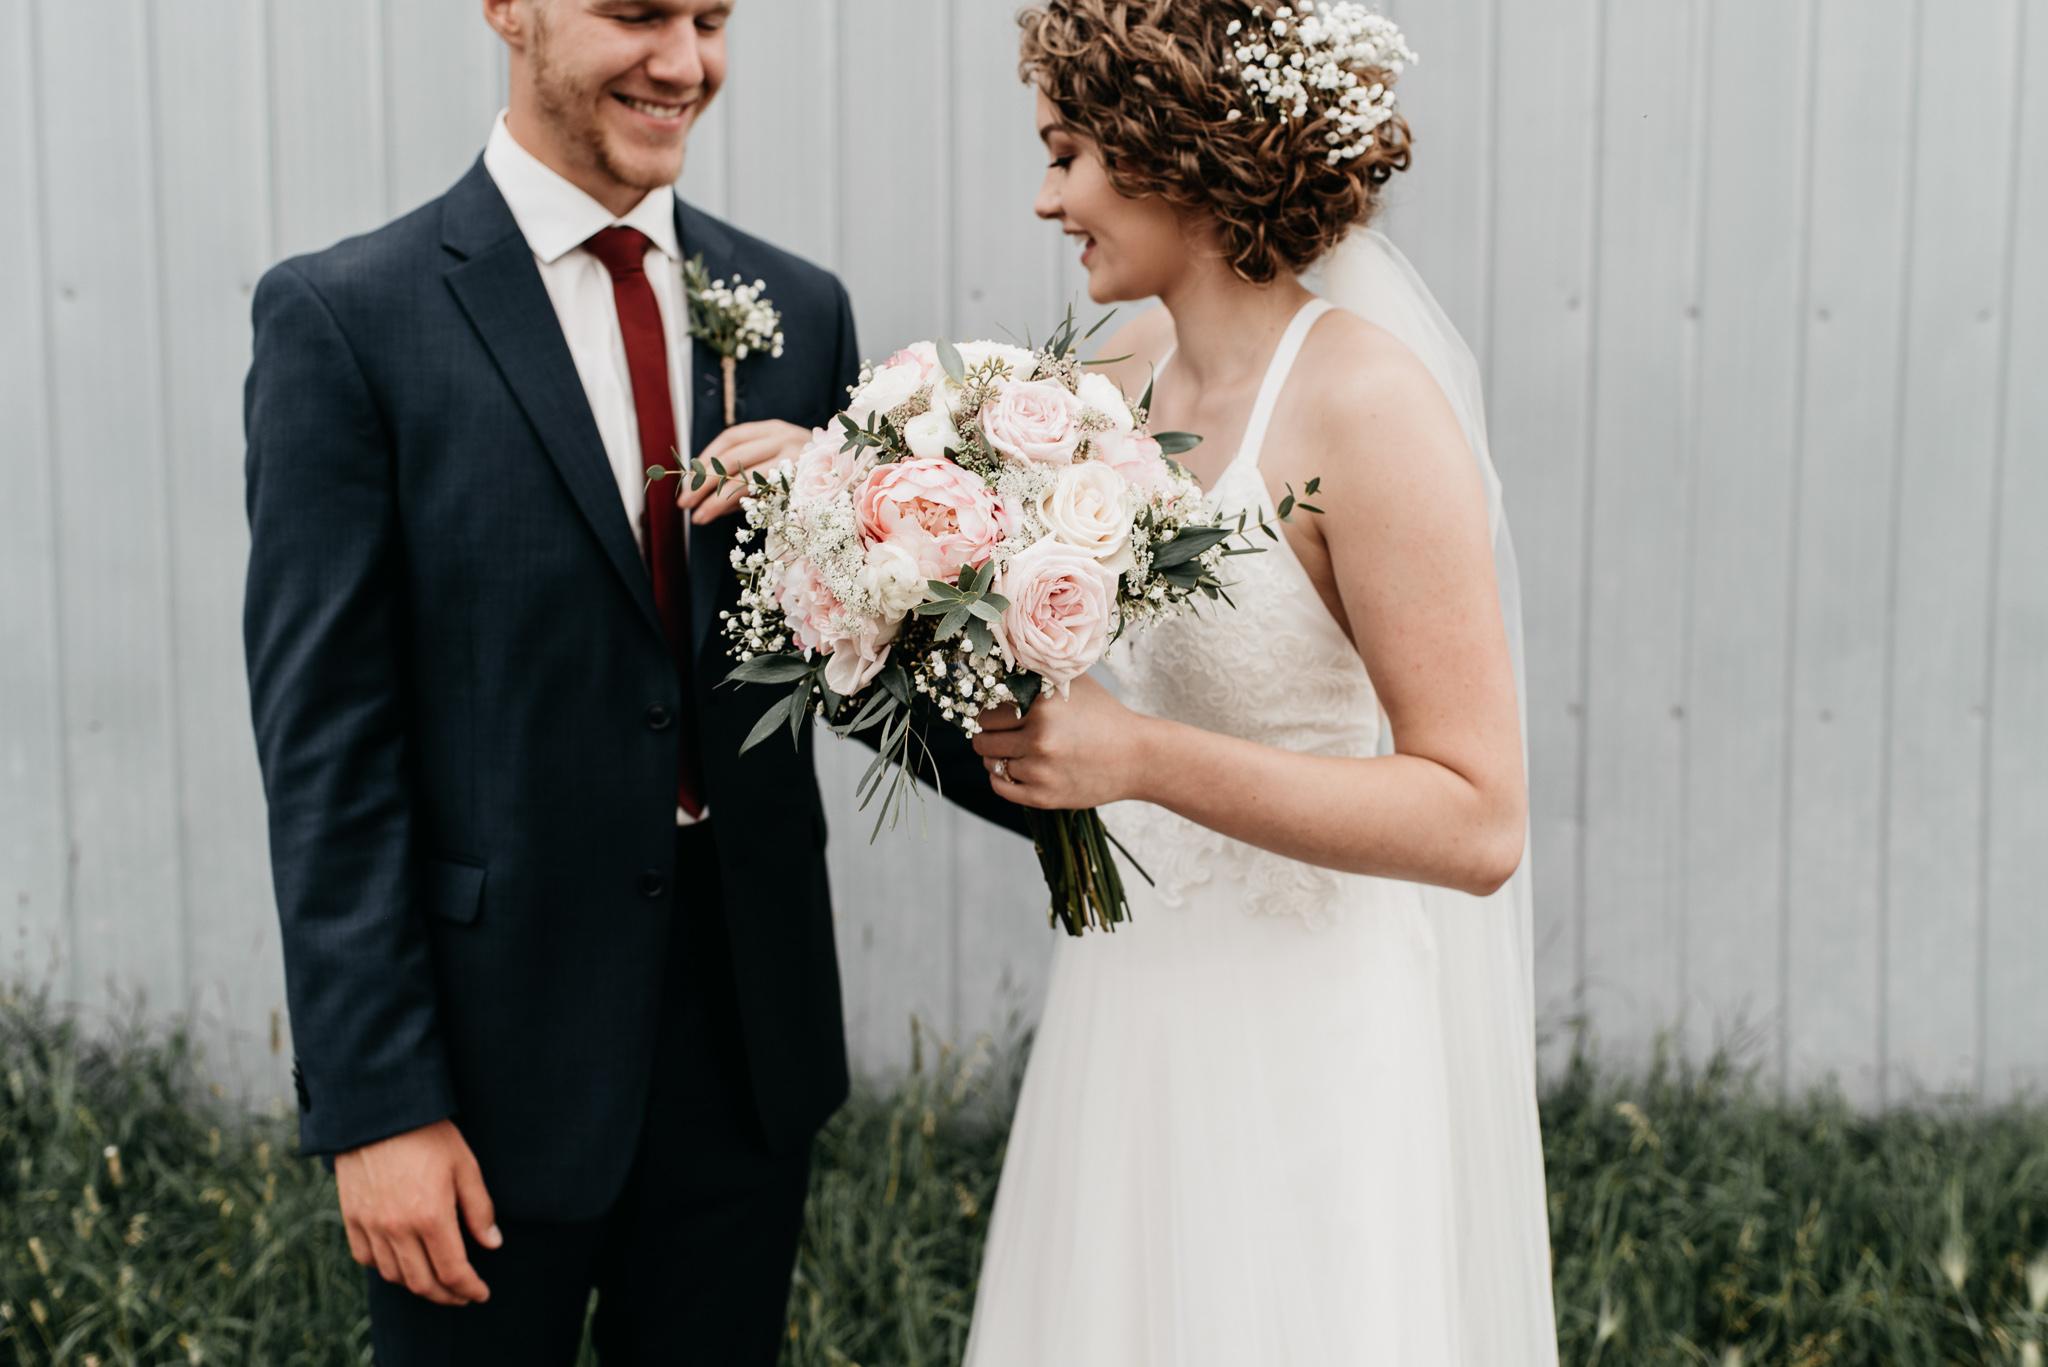 J&C-Weddingblog-26.jpg